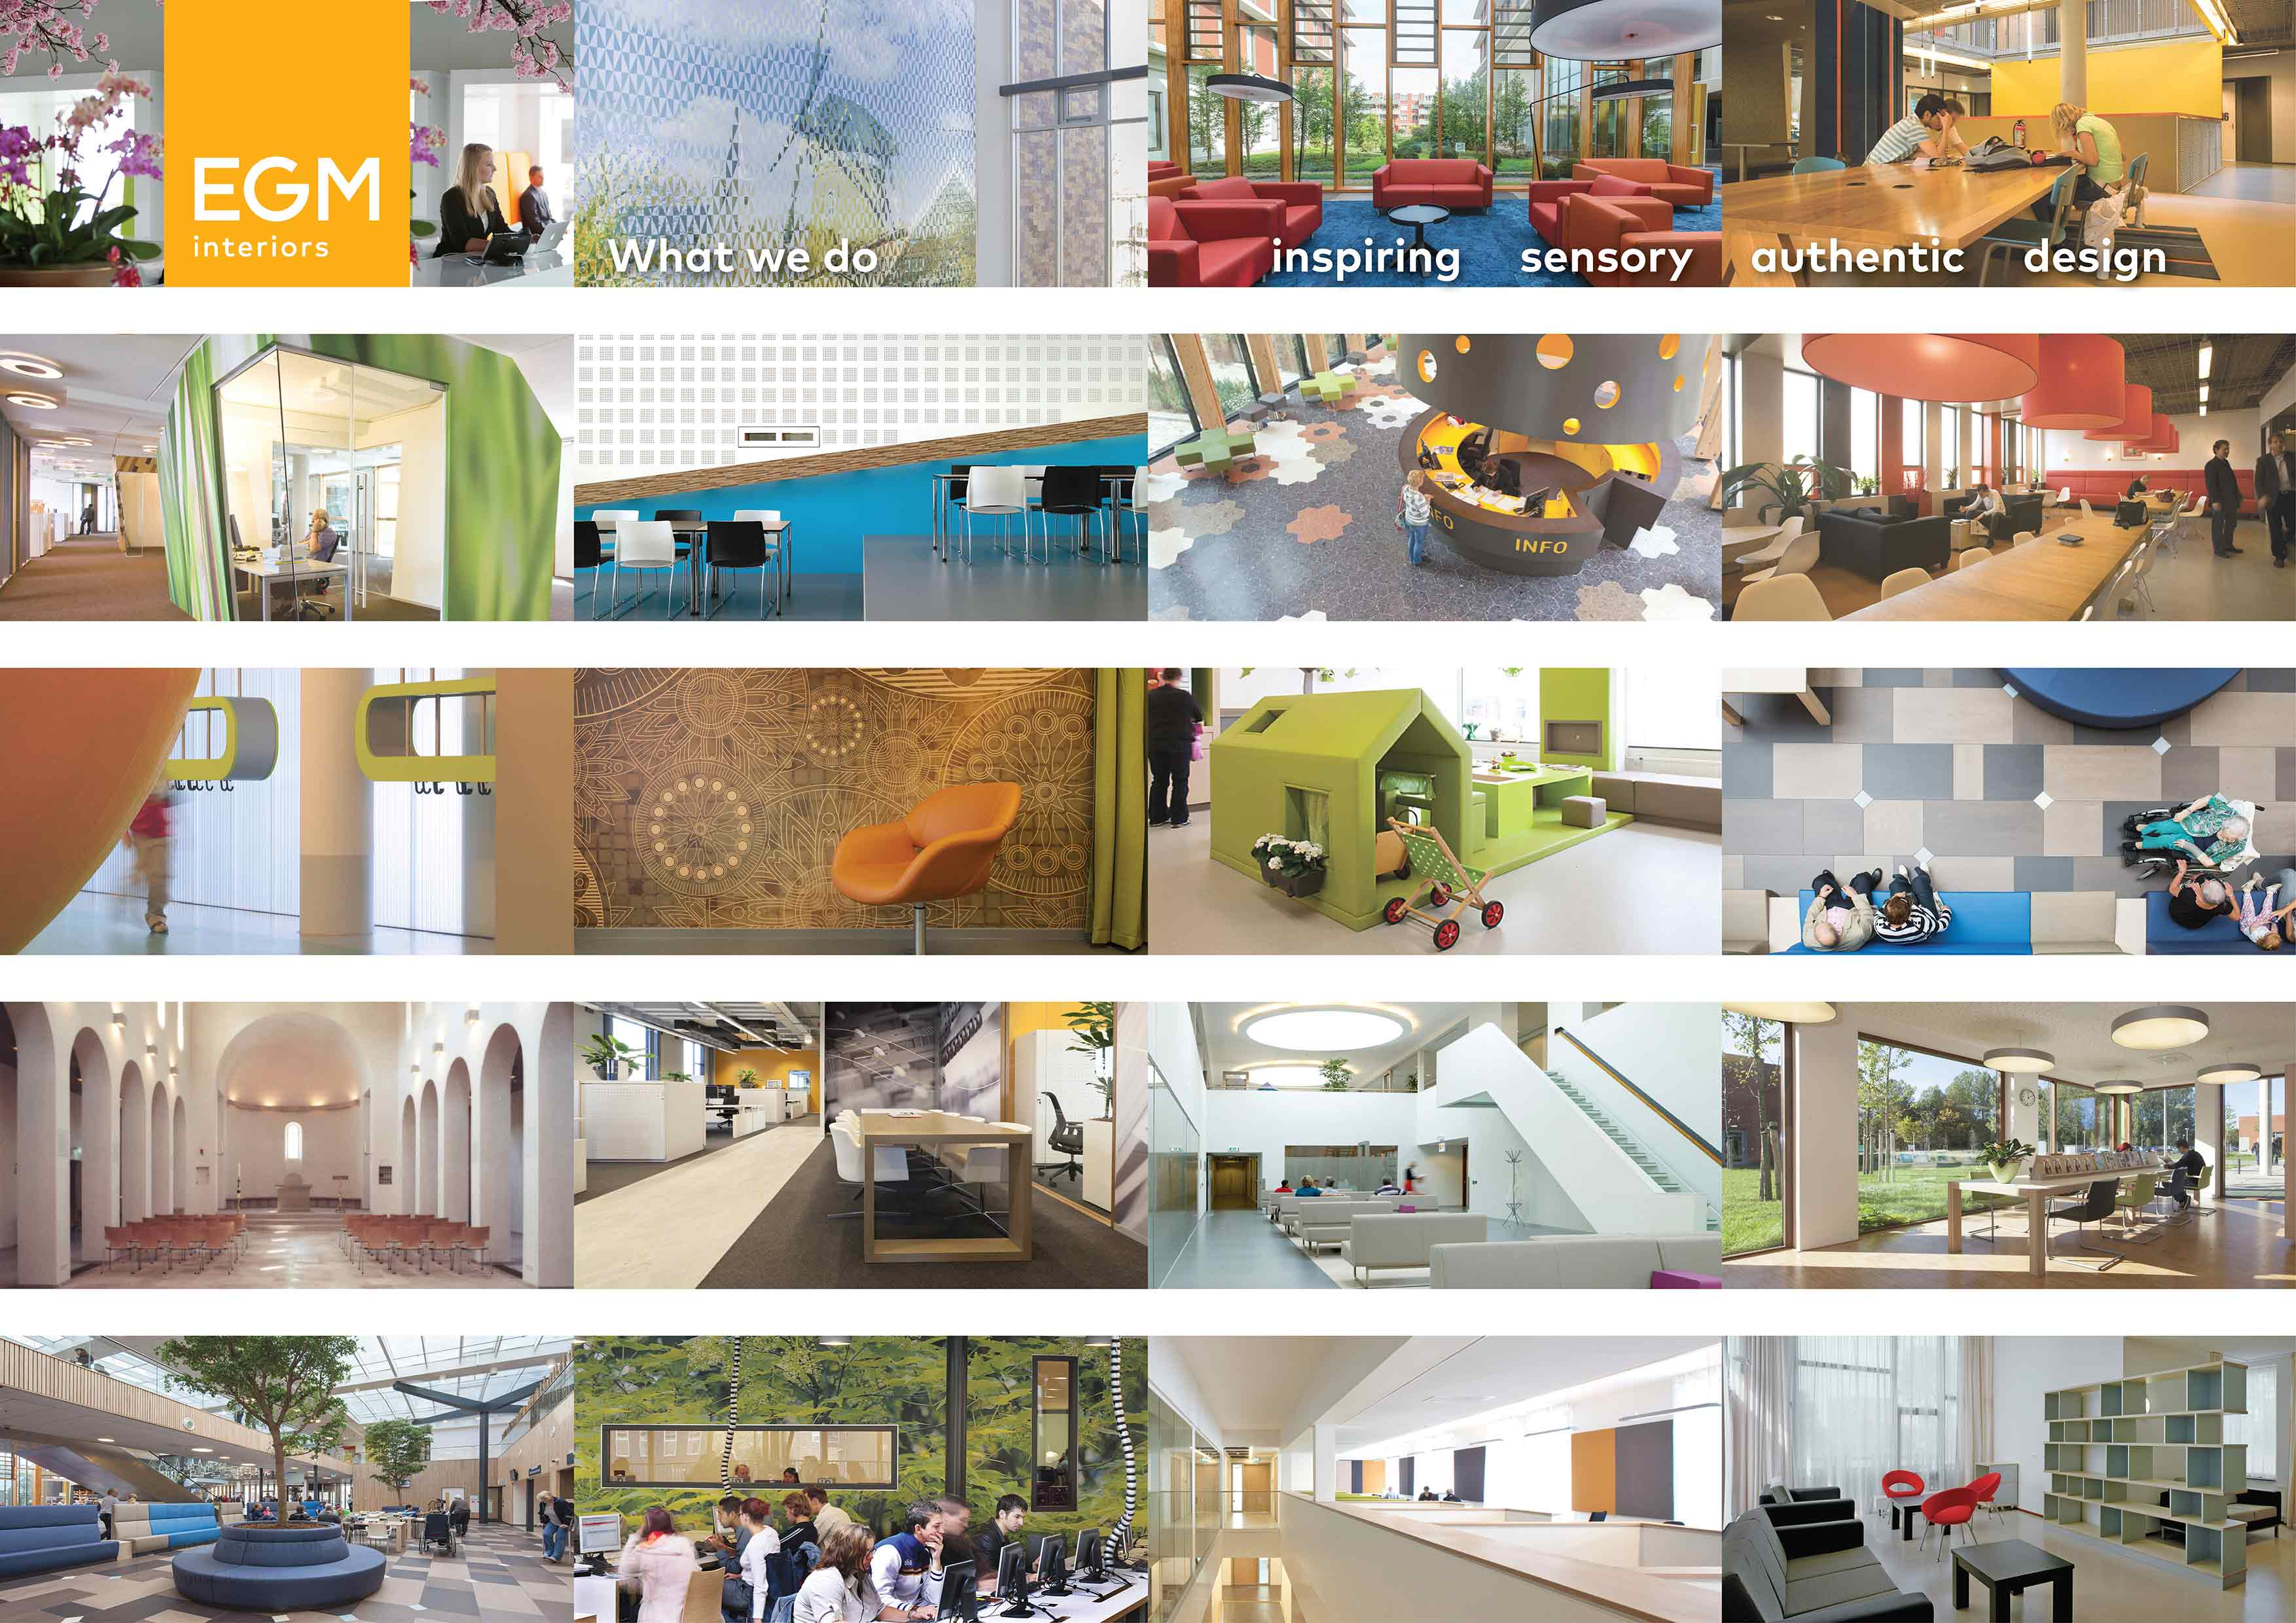 https://egm.nl/public/uploads/EGM-interieur-projects-03.jpg